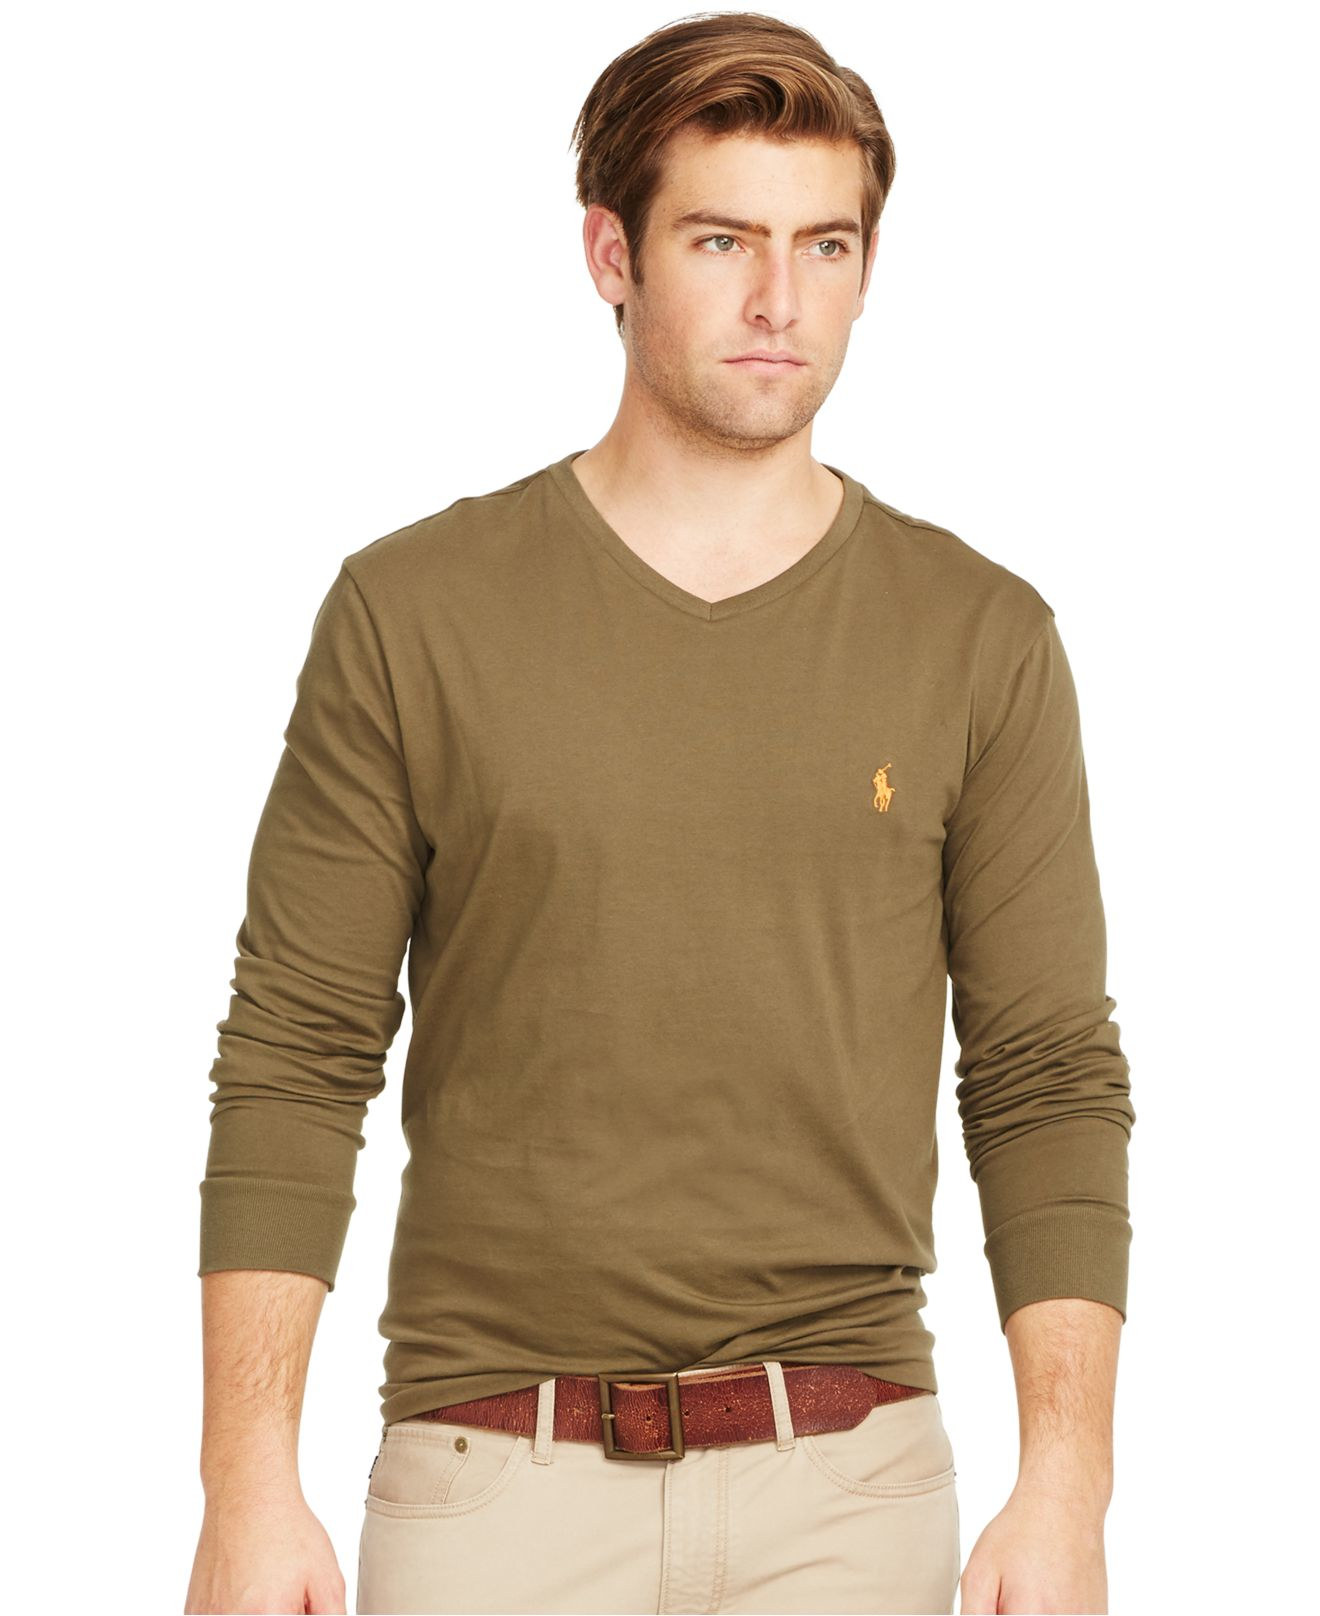 polo ralph lauren long sleeved jersey v neck in green for men lyst. Black Bedroom Furniture Sets. Home Design Ideas